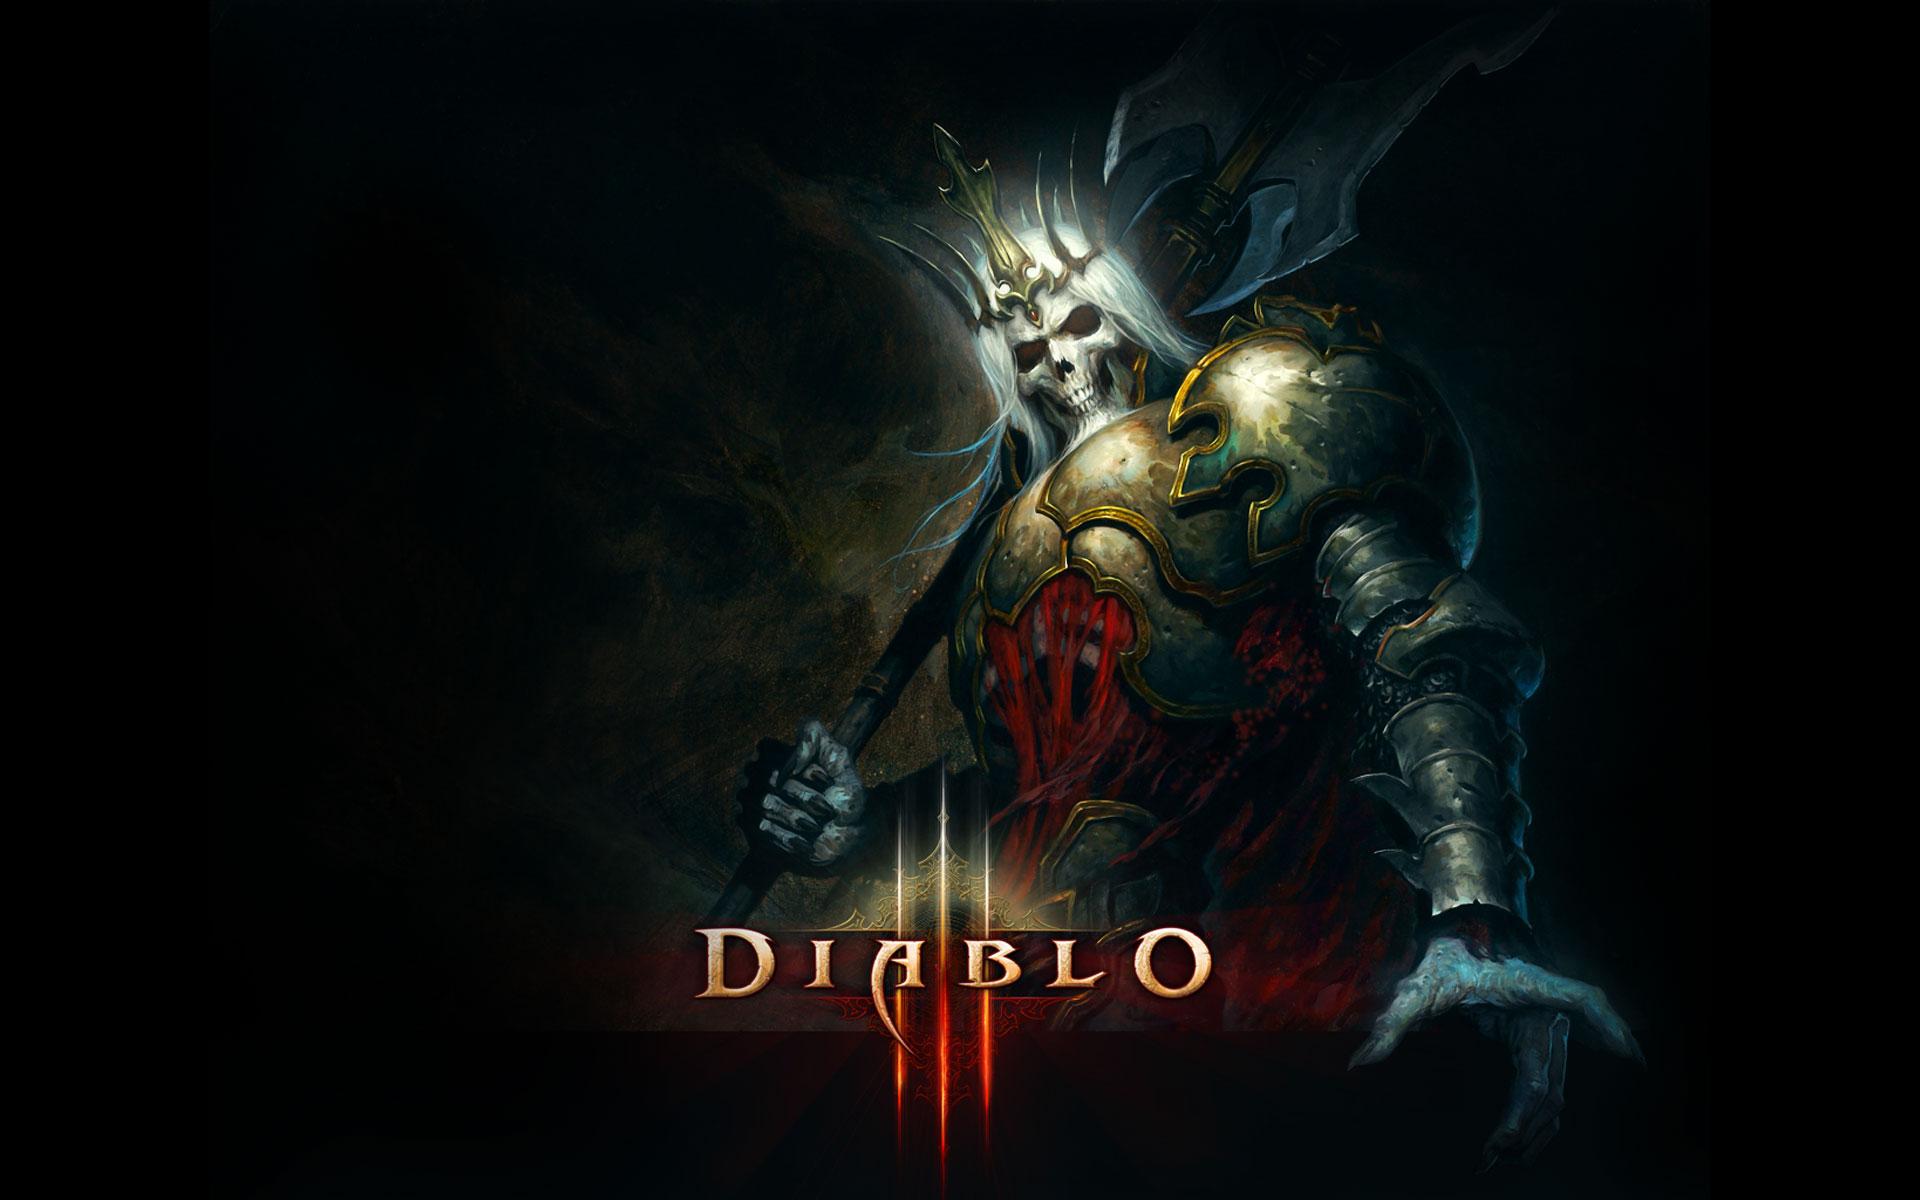 54 Diablo 3 Wallpaper On Wallpapersafari